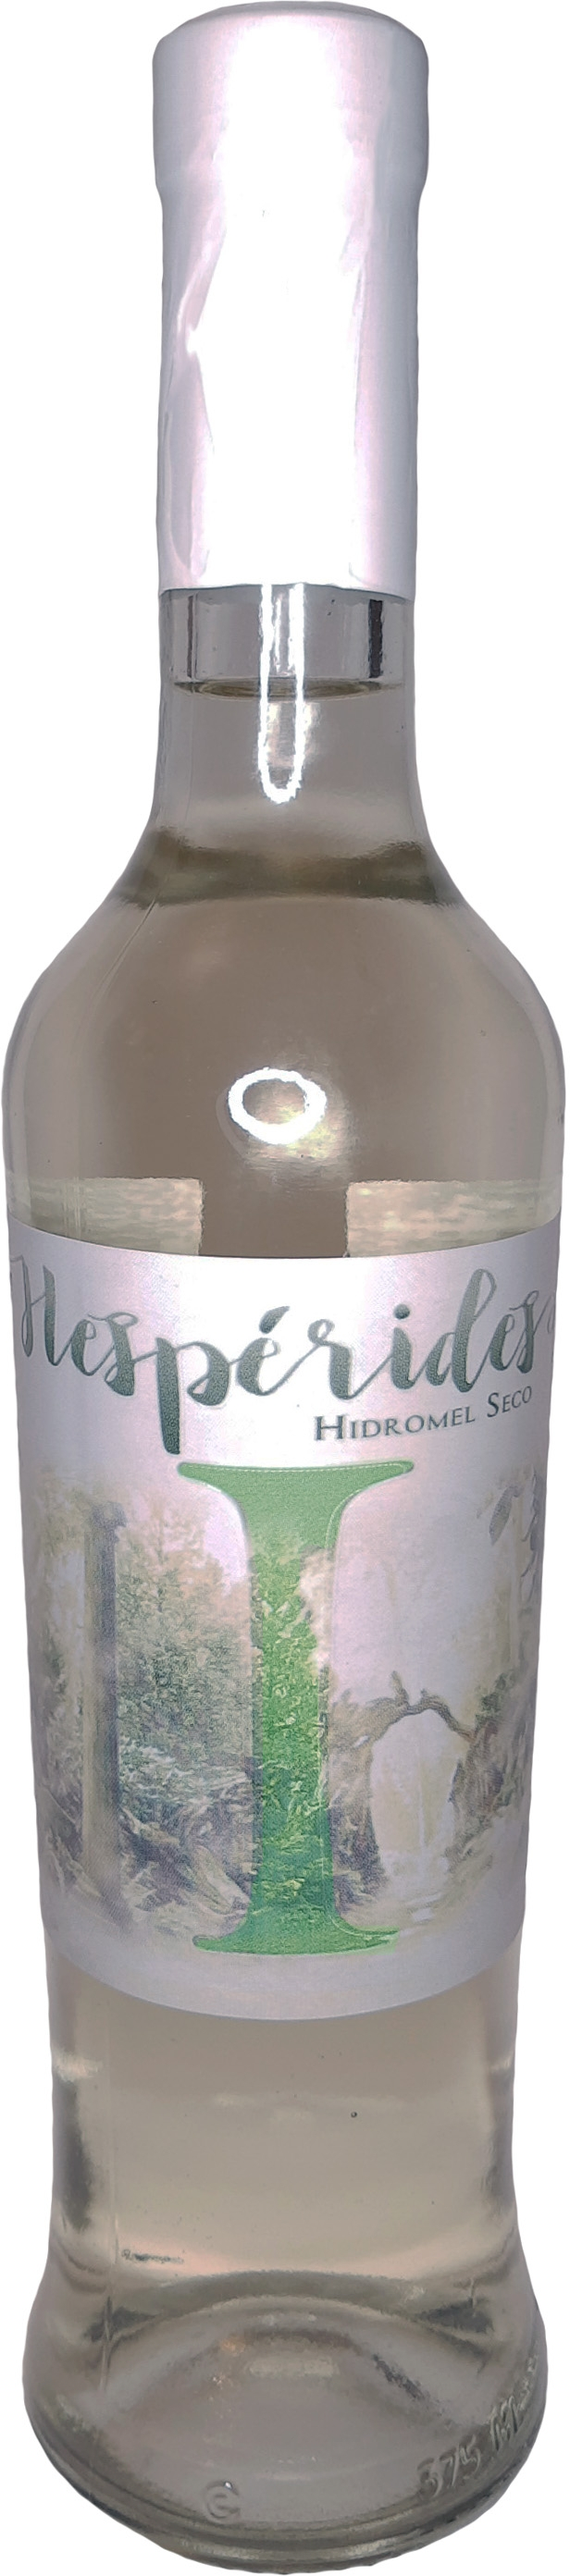 Hidromel Seco Hesperides - 375ml